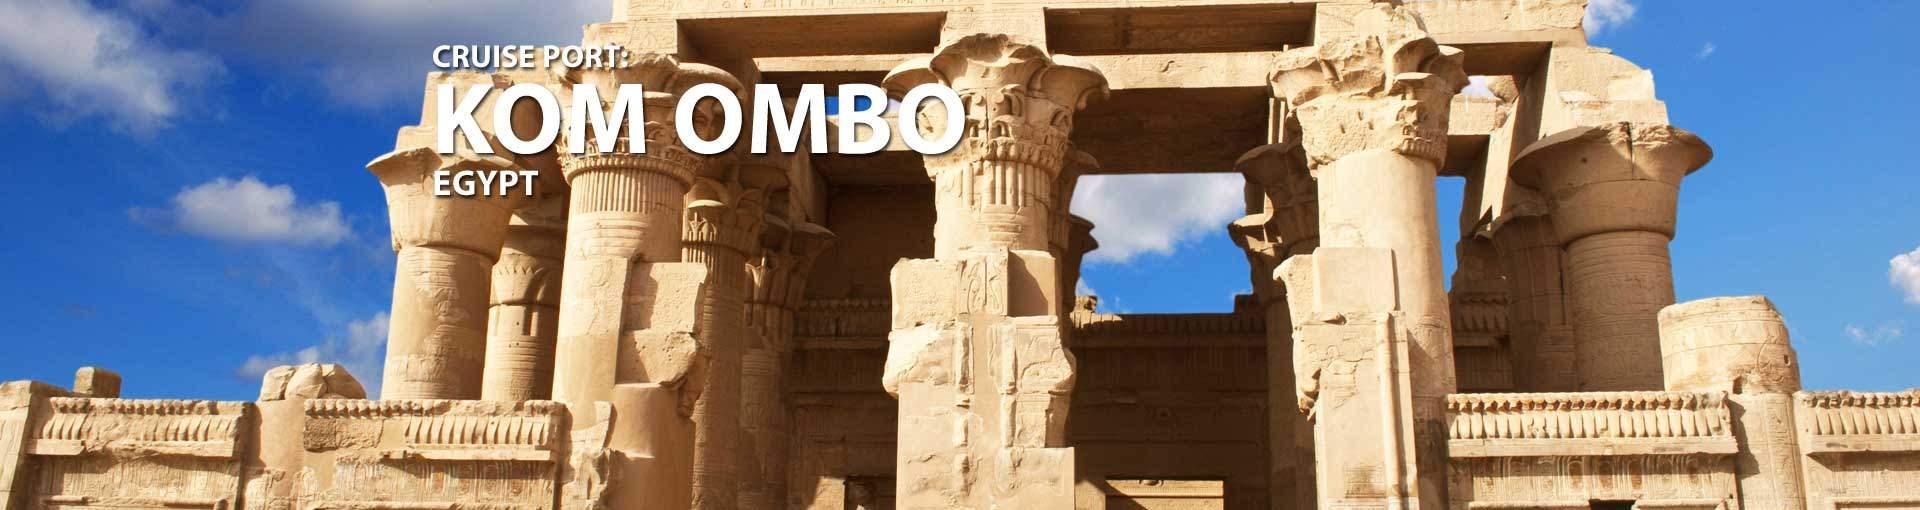 Cruises to Kom Ombo, Egypt